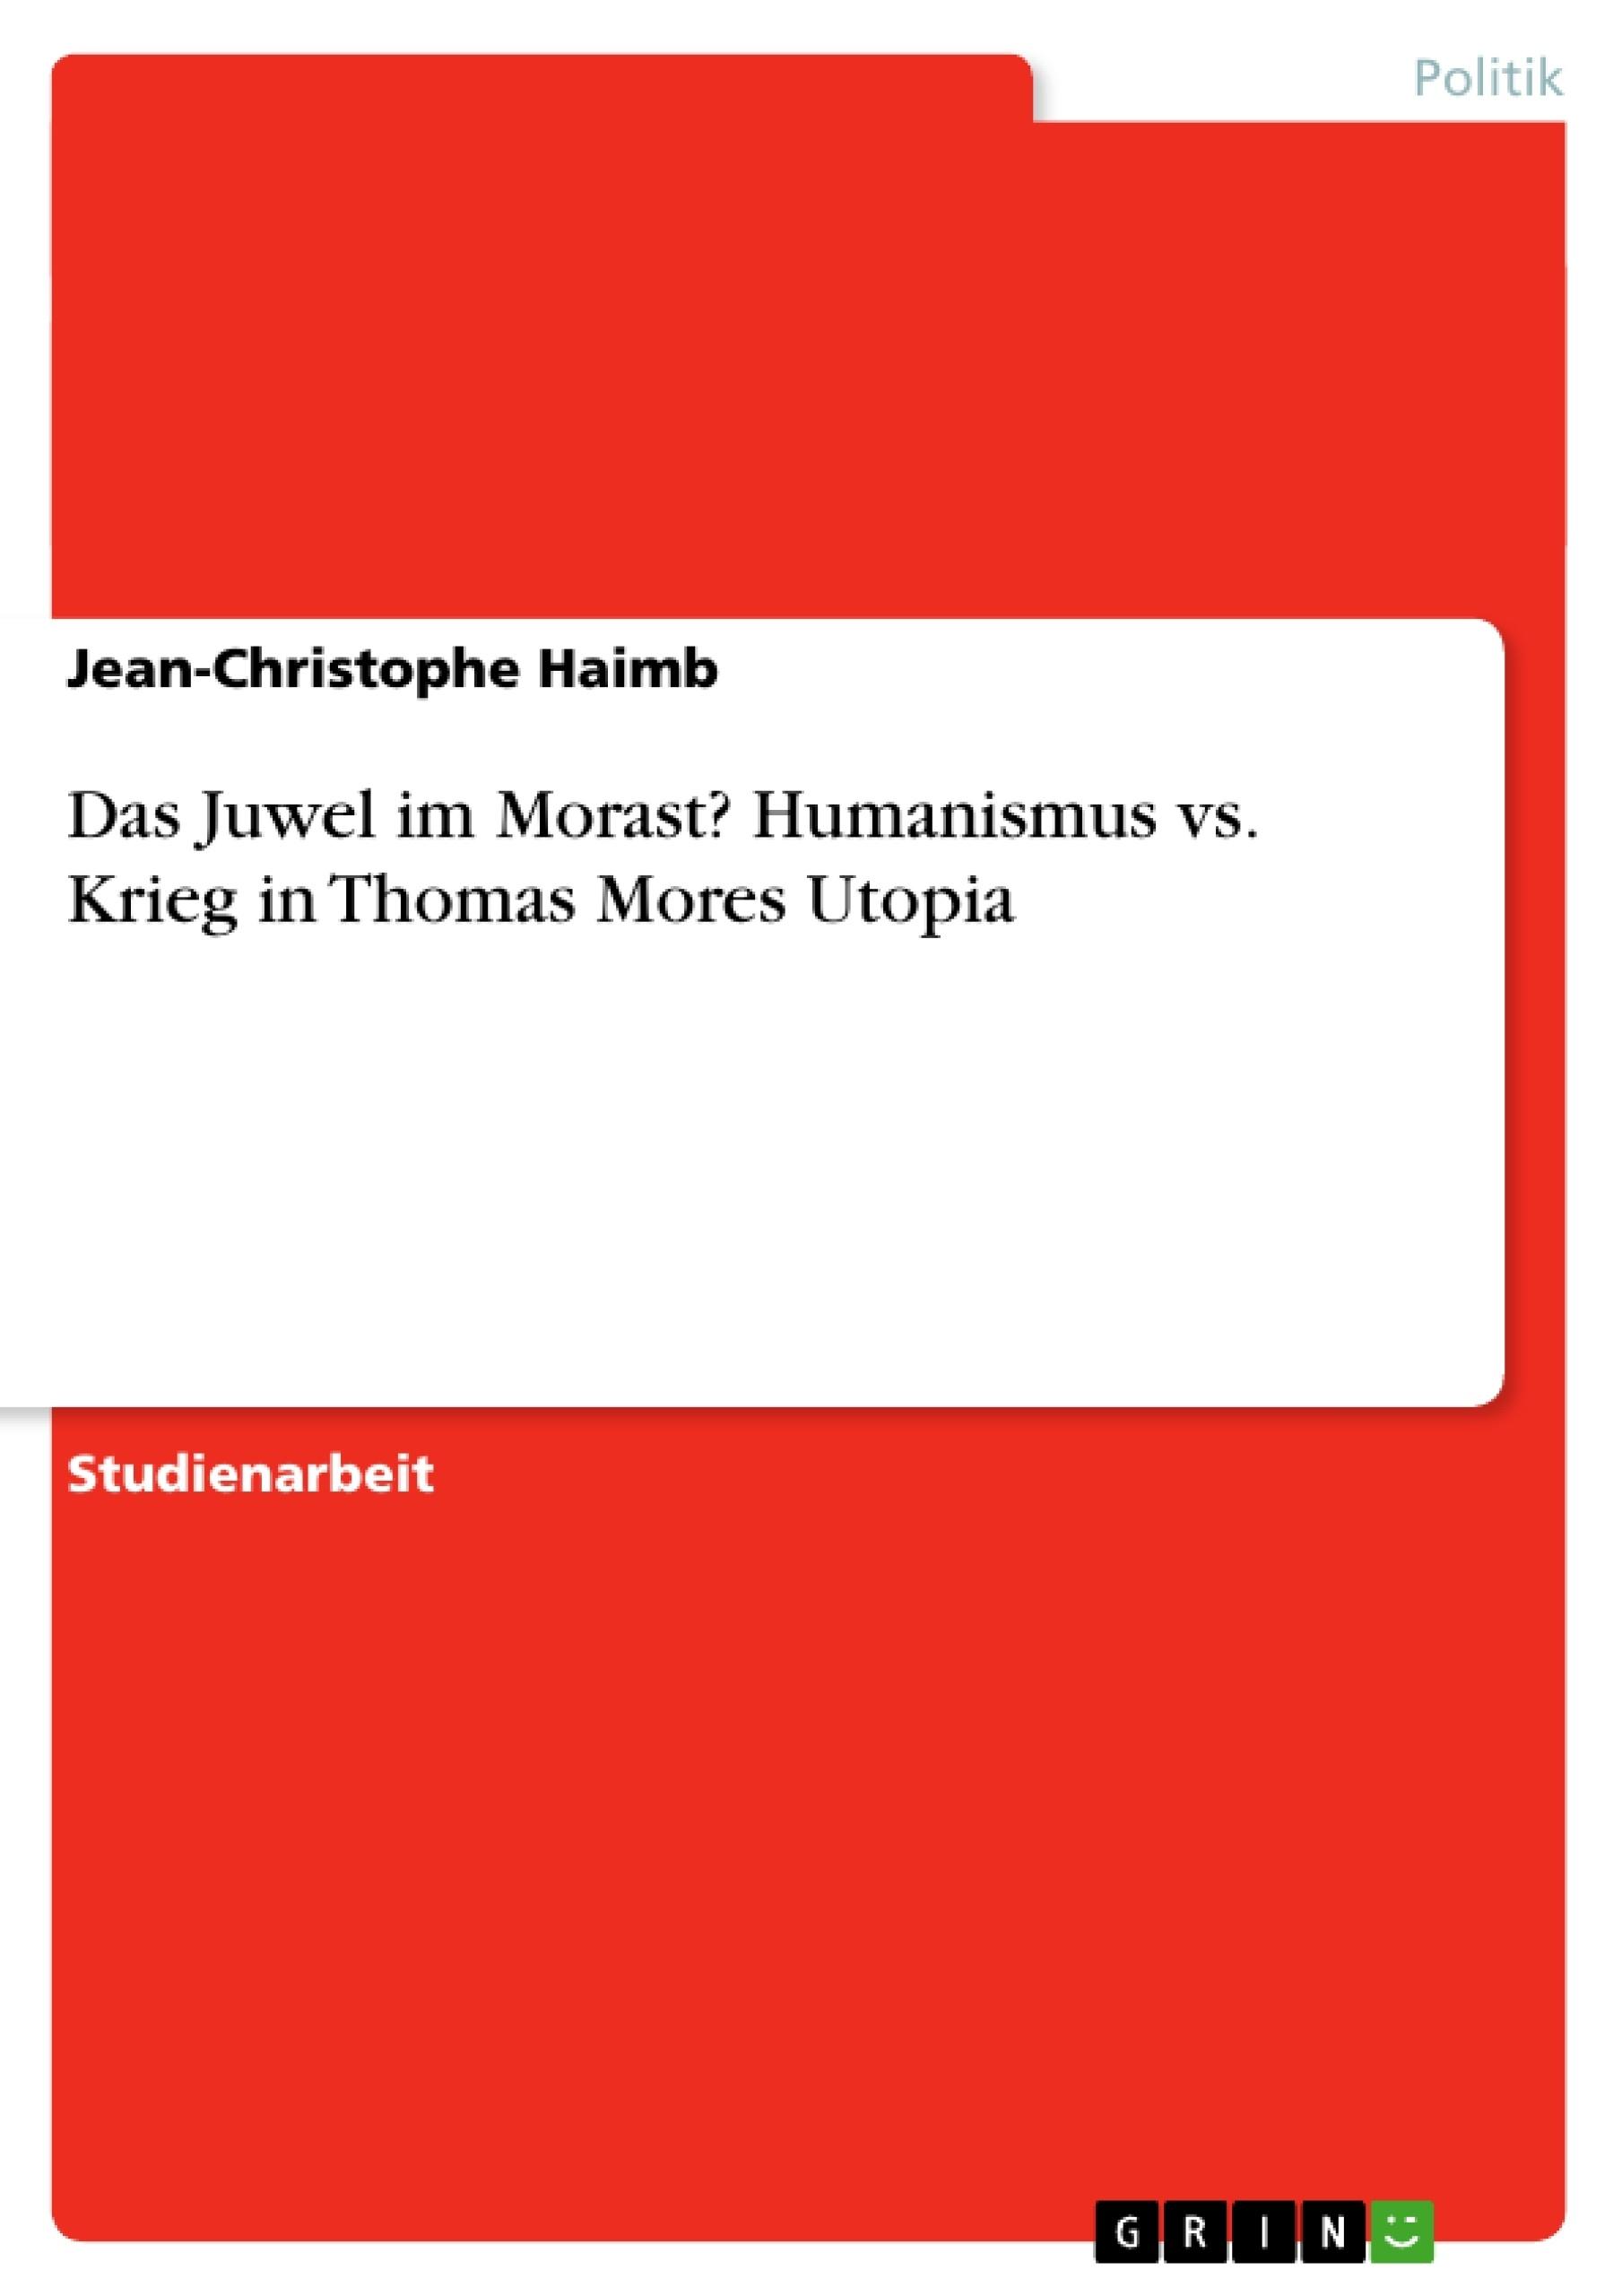 Titel: Das Juwel im Morast? Humanismus vs. Krieg in Thomas Mores Utopia